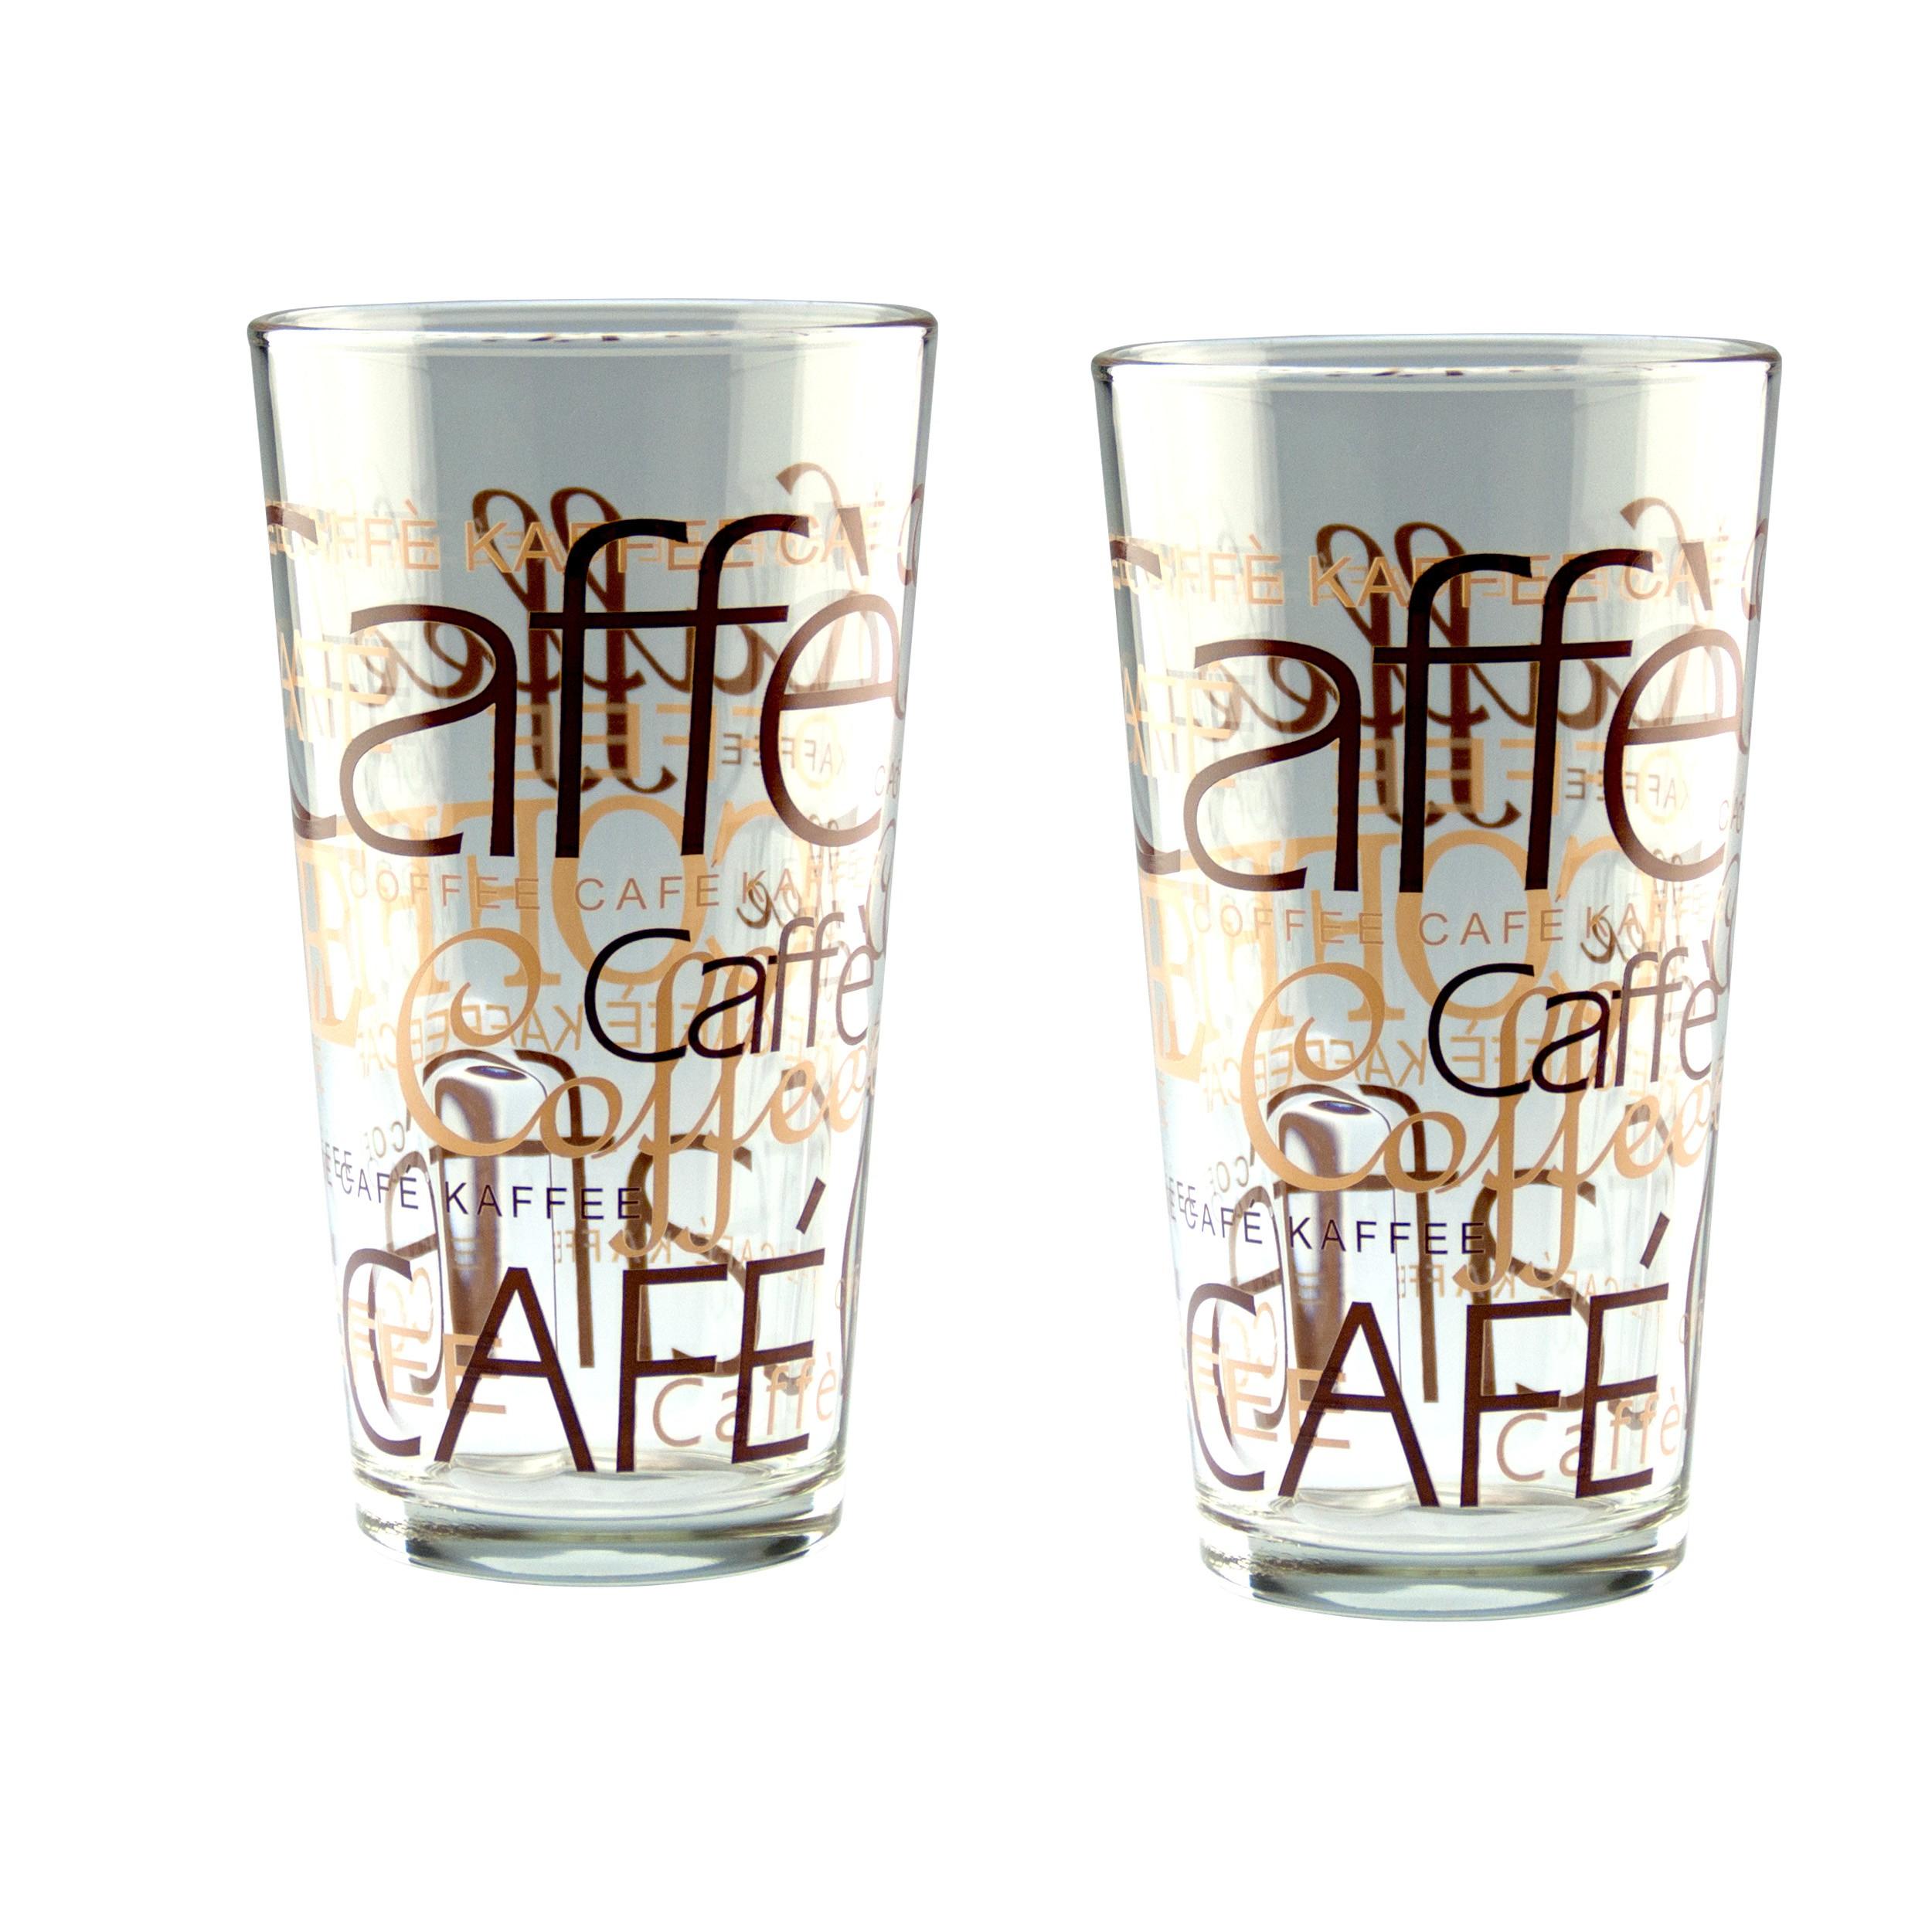 2er set latte macchiato glas 39cl stapelbar coffee dekor glas kaffeegl ser. Black Bedroom Furniture Sets. Home Design Ideas